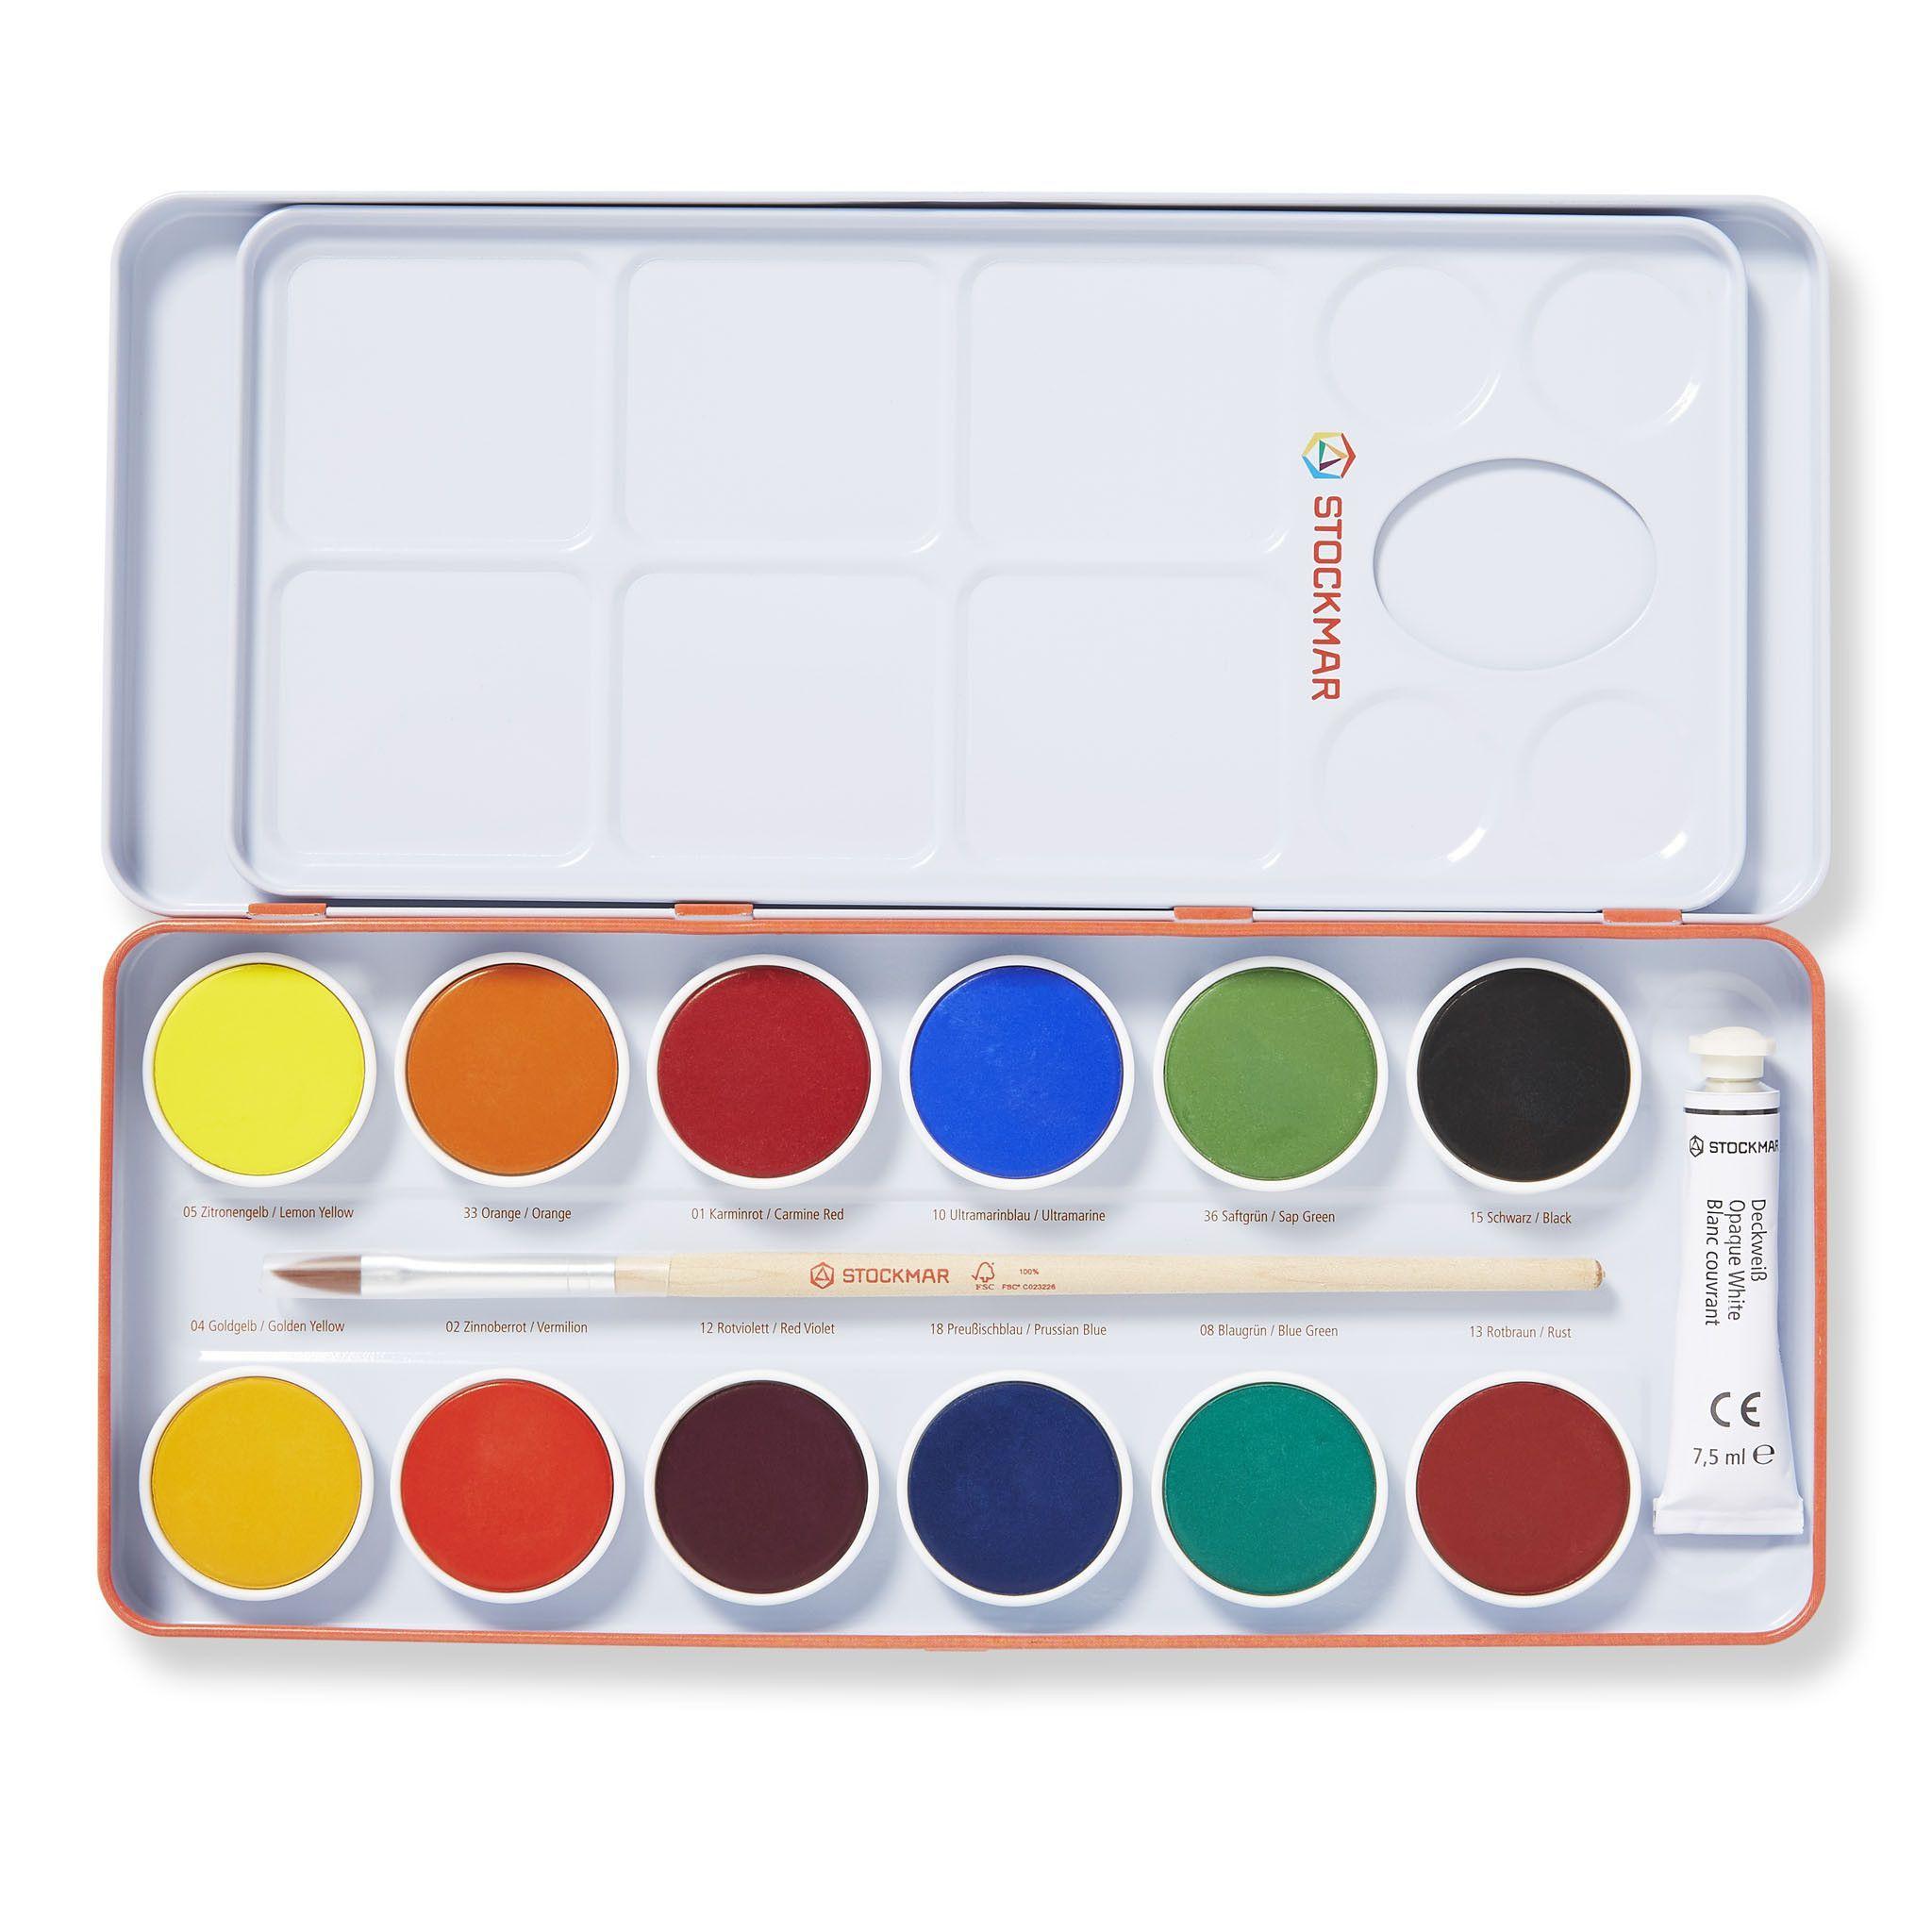 Stockmar Opaque Water Colours Watercolor Paints Painted Boxes